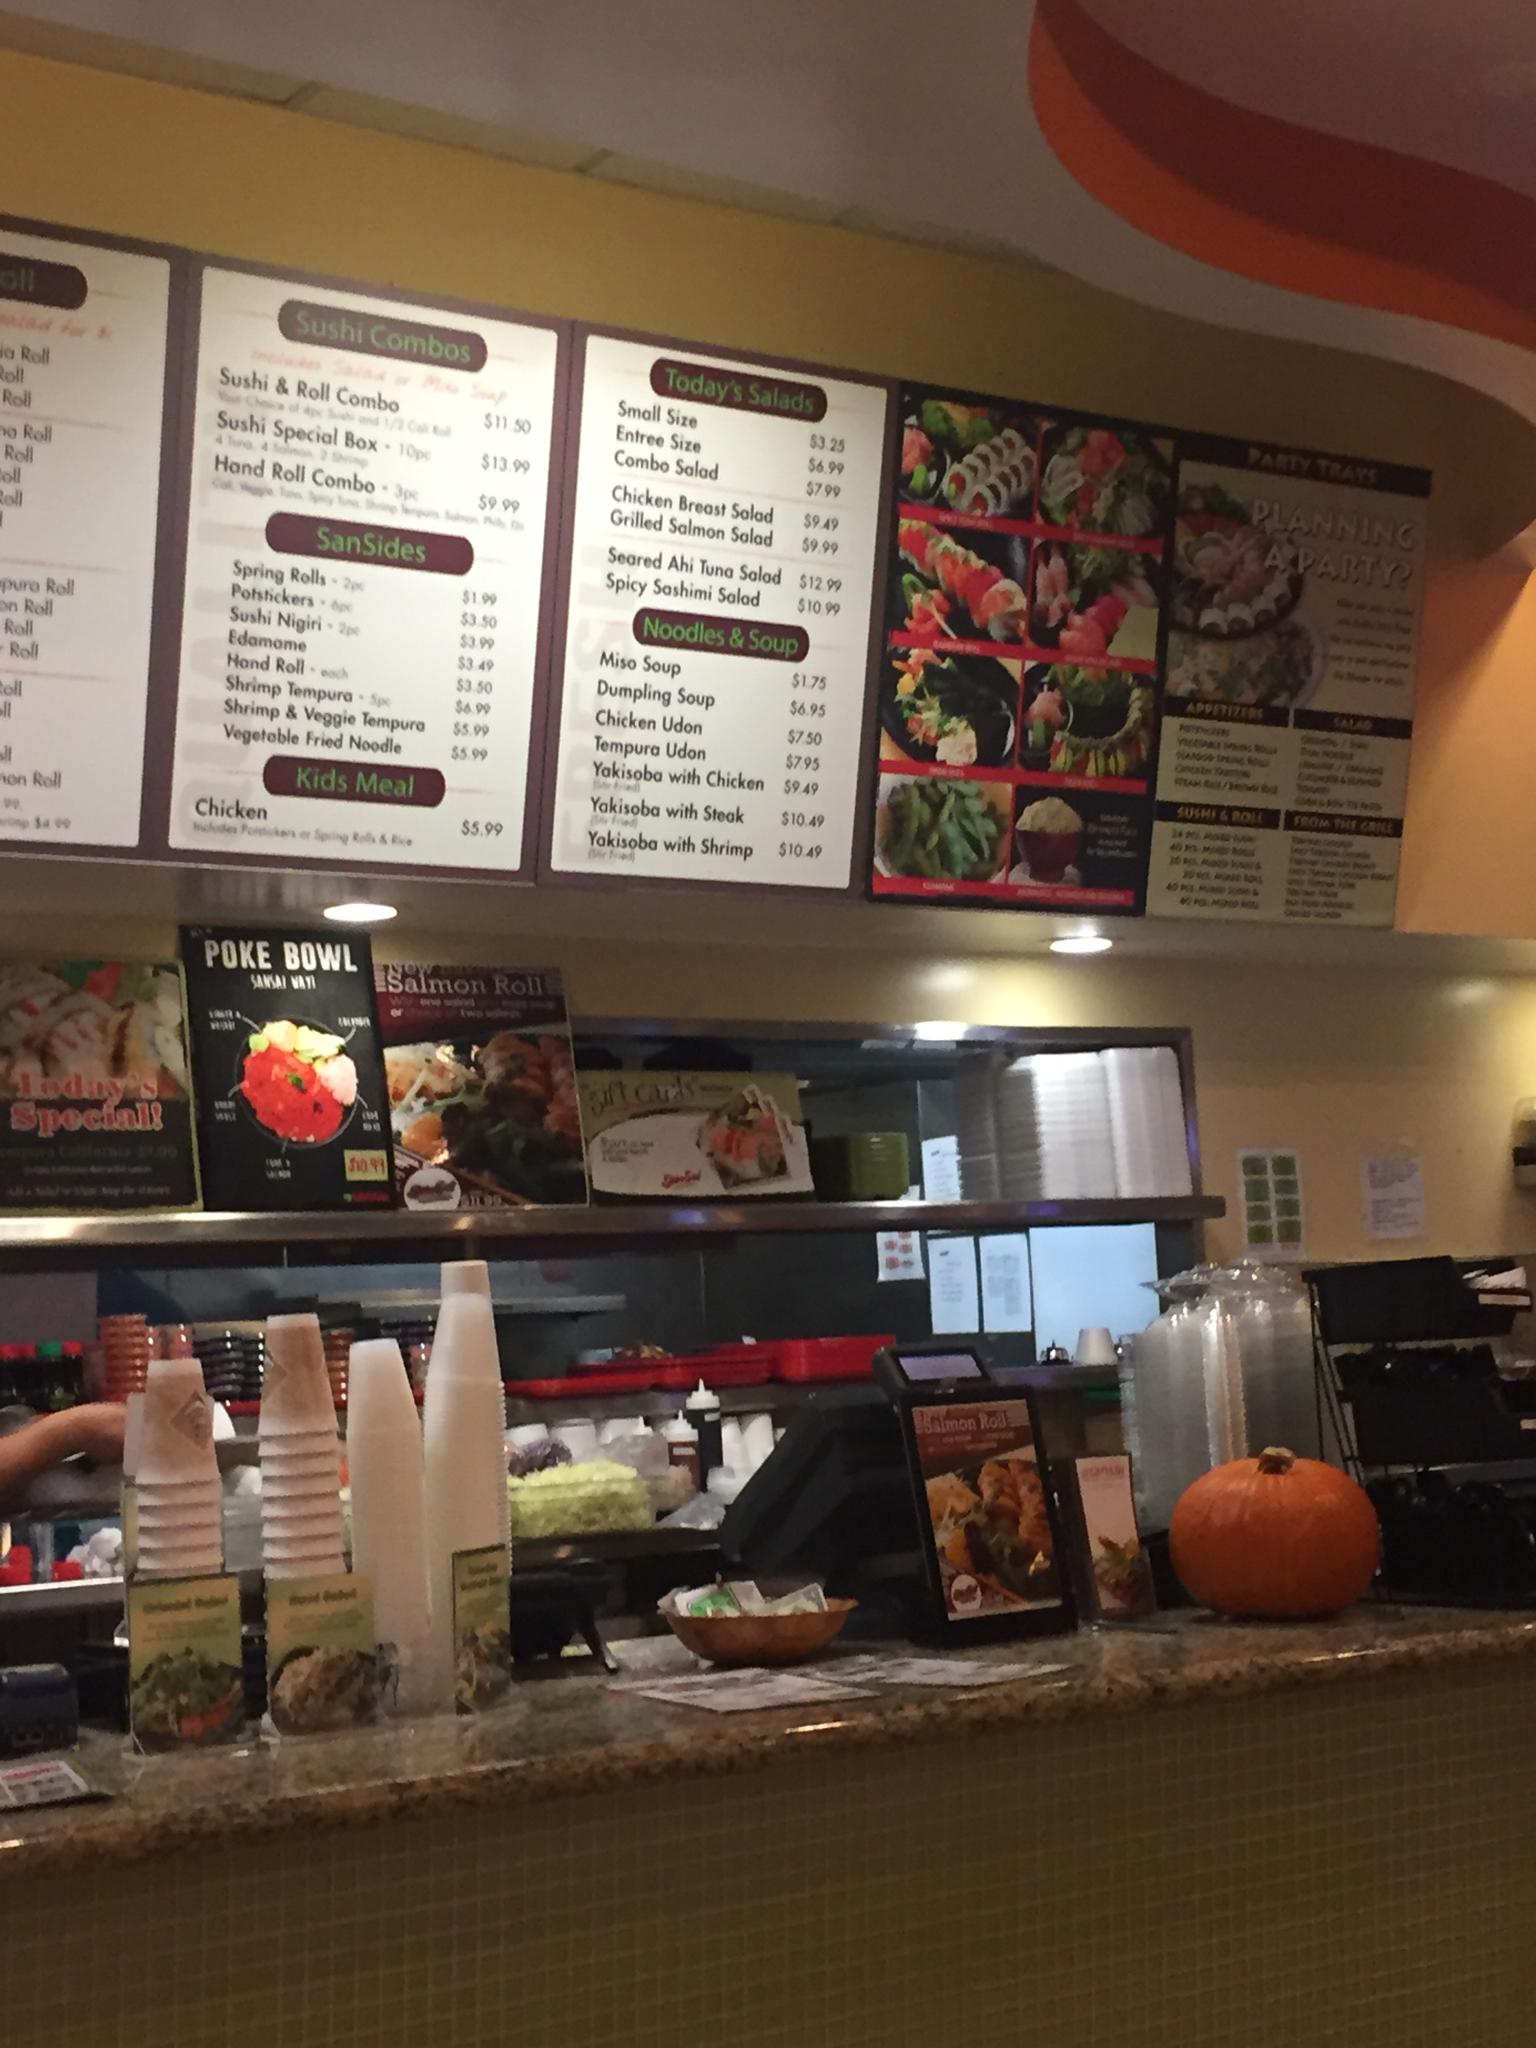 SanSai Japanese Grill 2575 N Hollywood Way Ste 107, Burbank